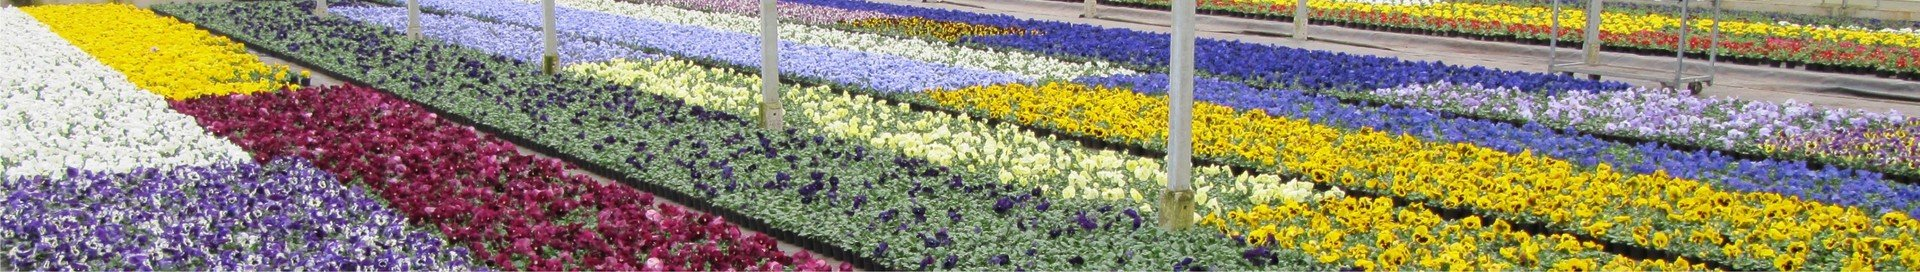 Vroege-voorjaar-(februari-maart)